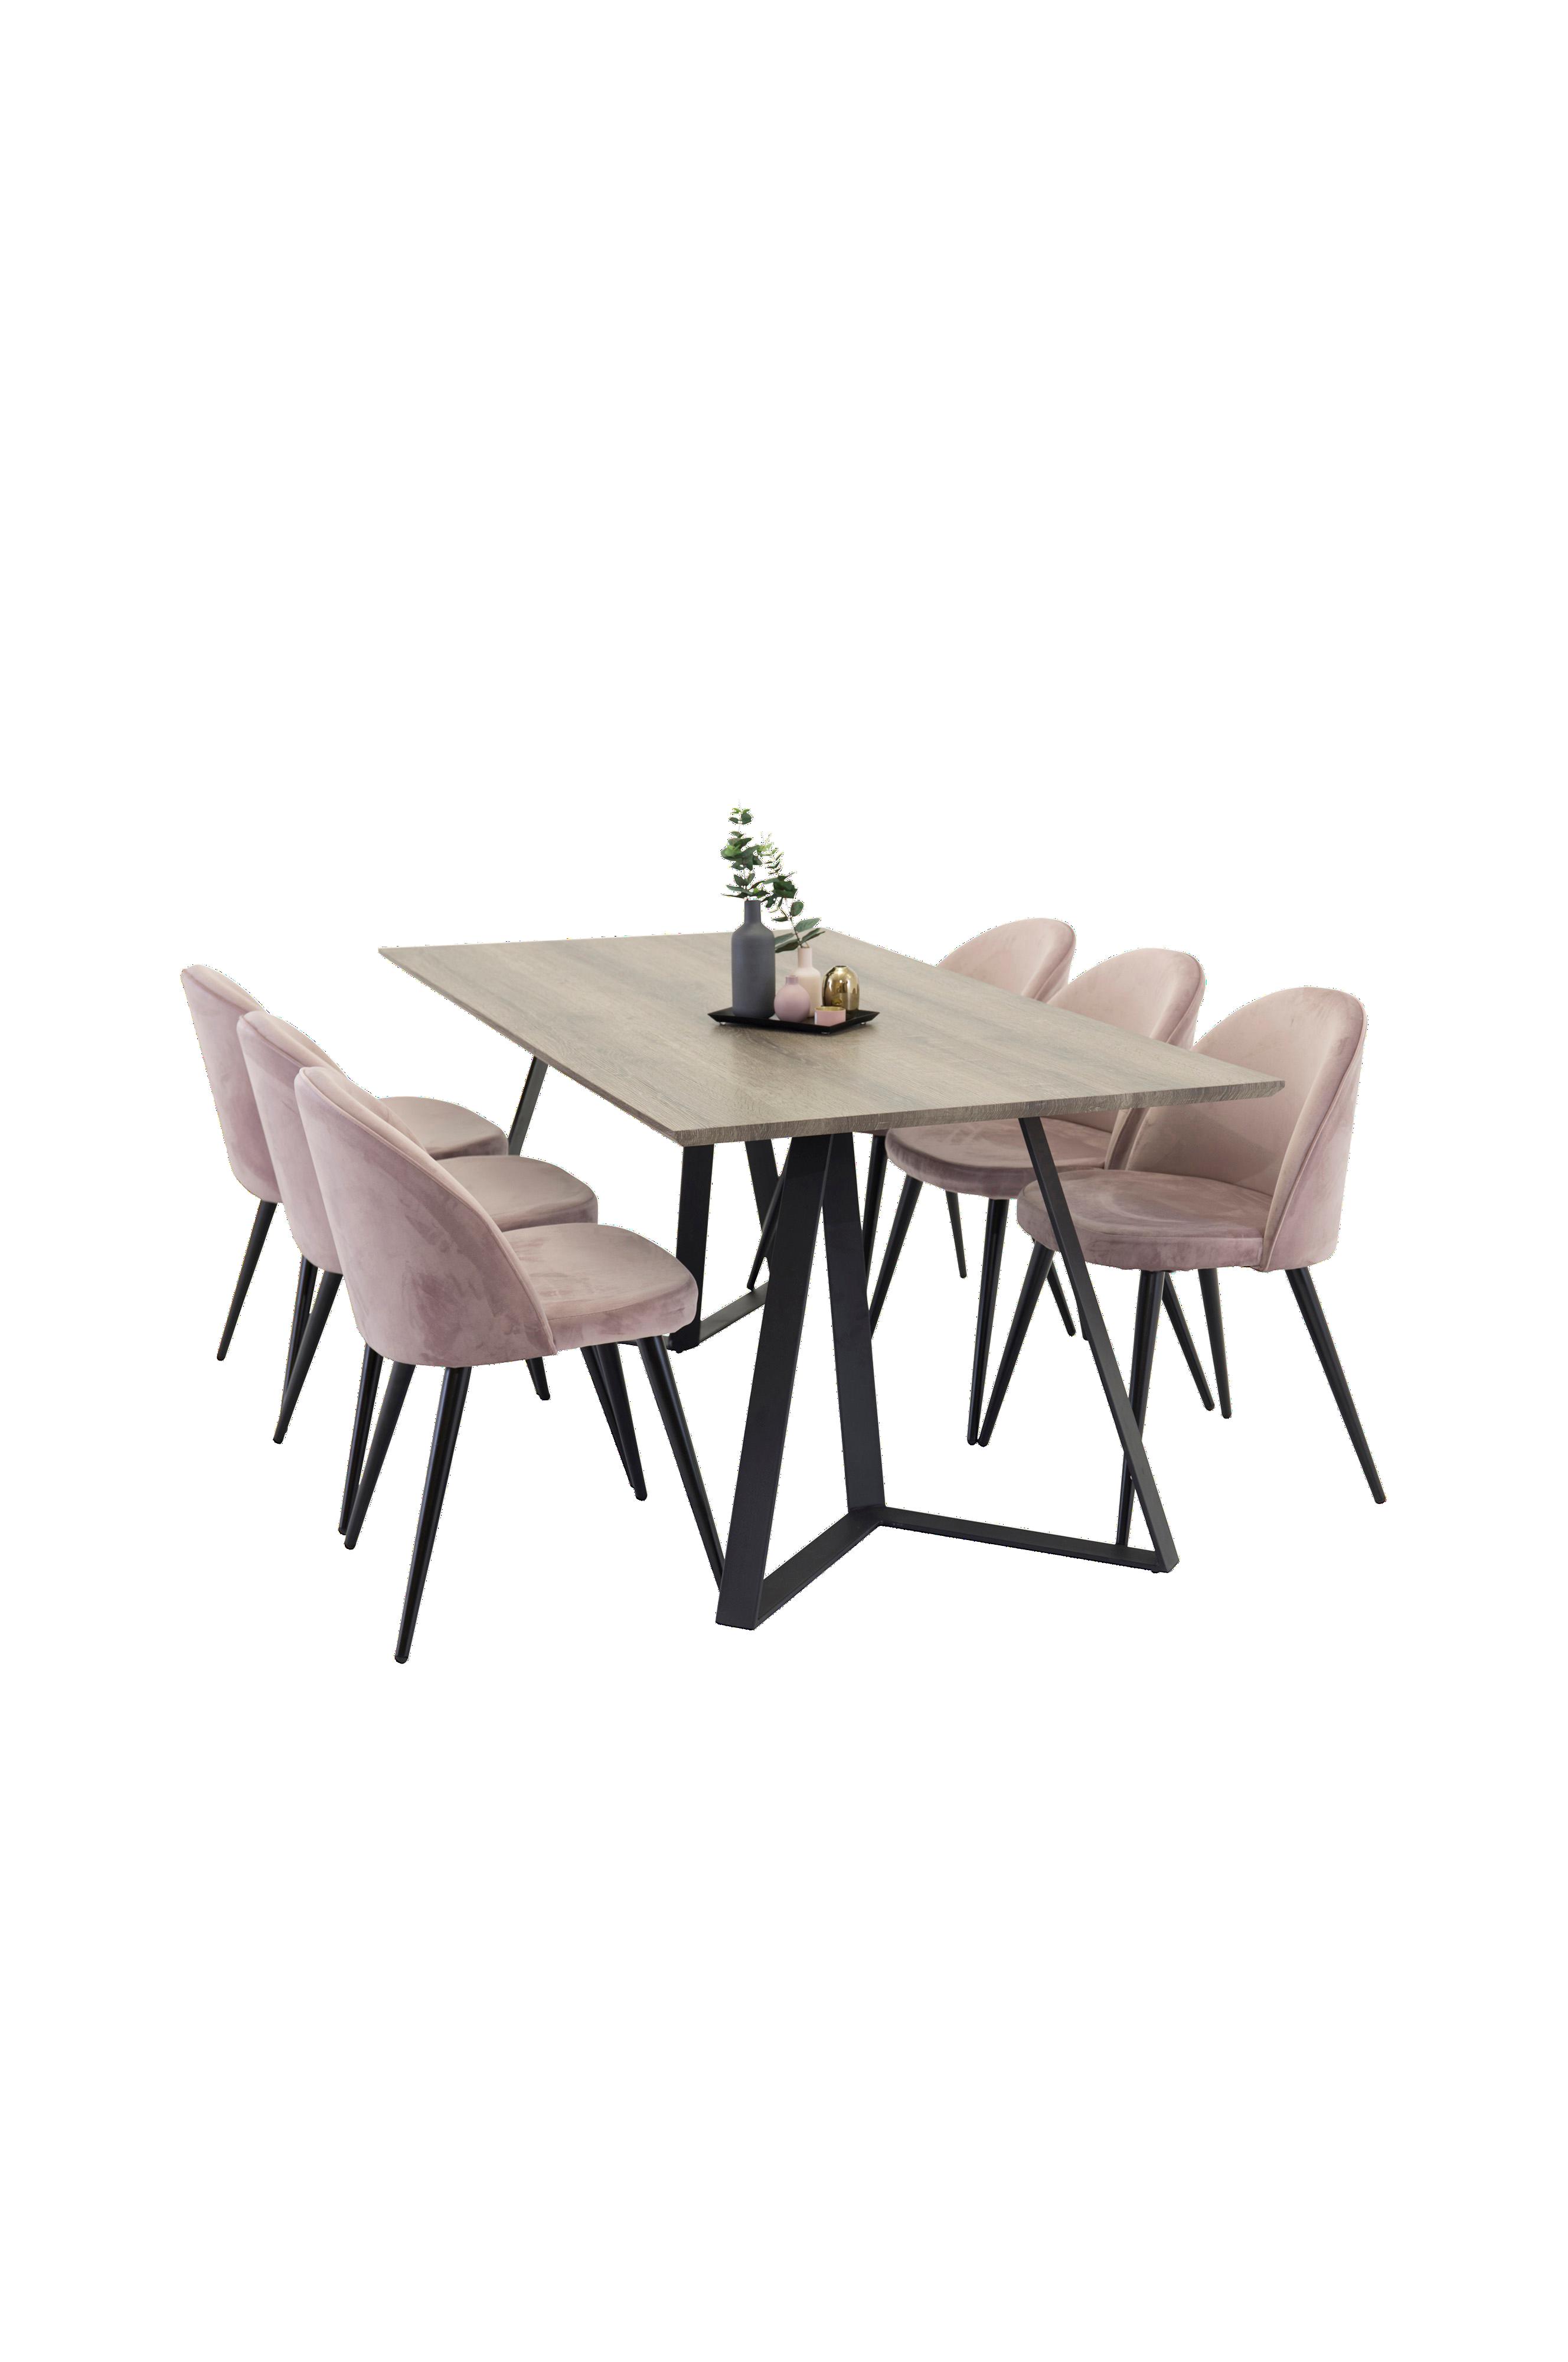 NORDFORM Maggie Spisebord og 6 Velvet stol Blå Møbler